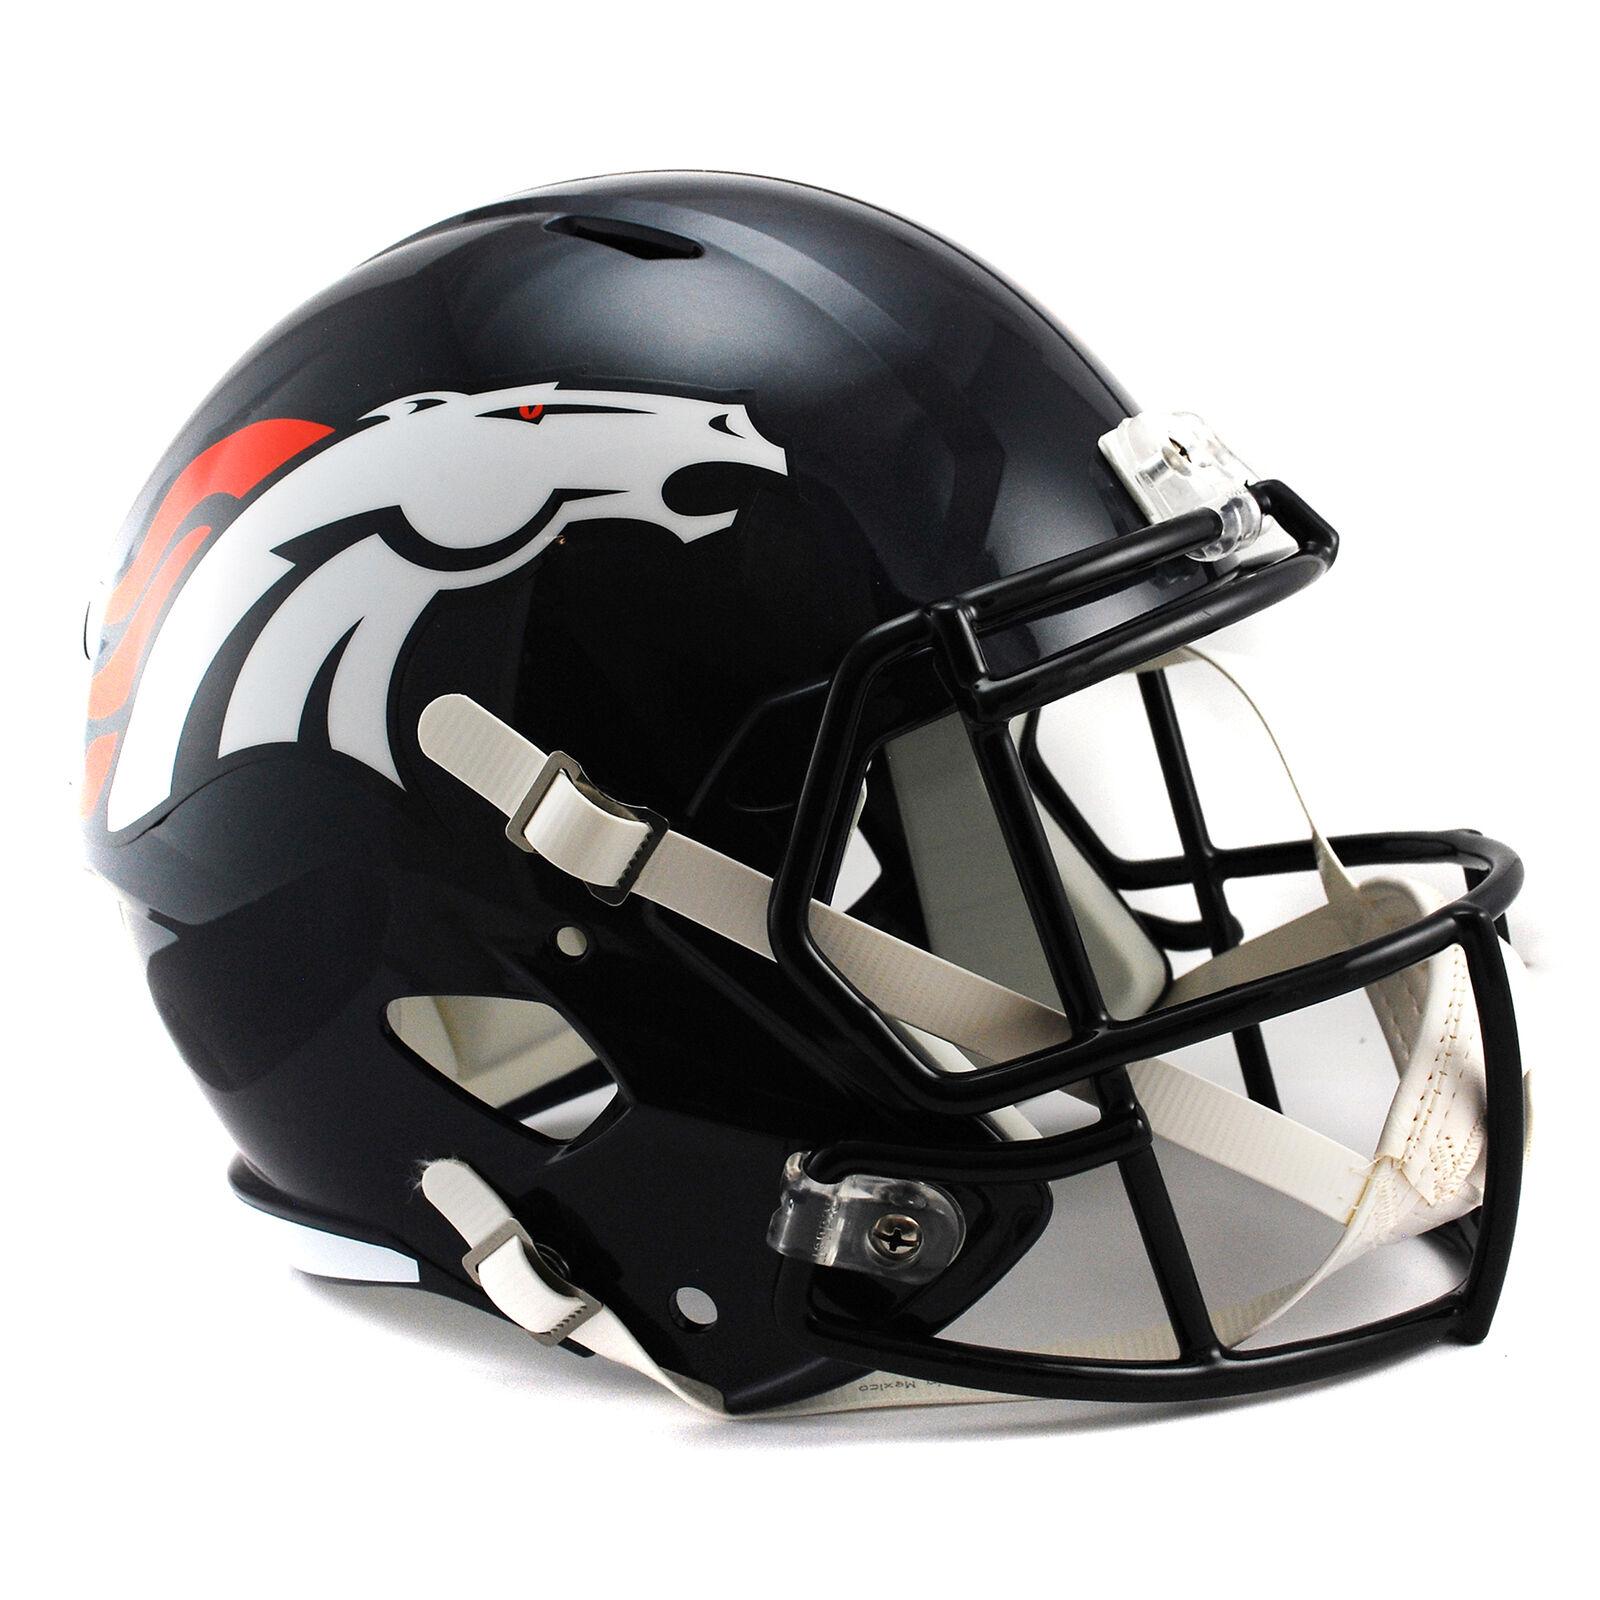 NFL Denver Broncos Broncos Broncos Speed Replik Football Helm Fan Artikel Unisex Fanatics 20fb5a